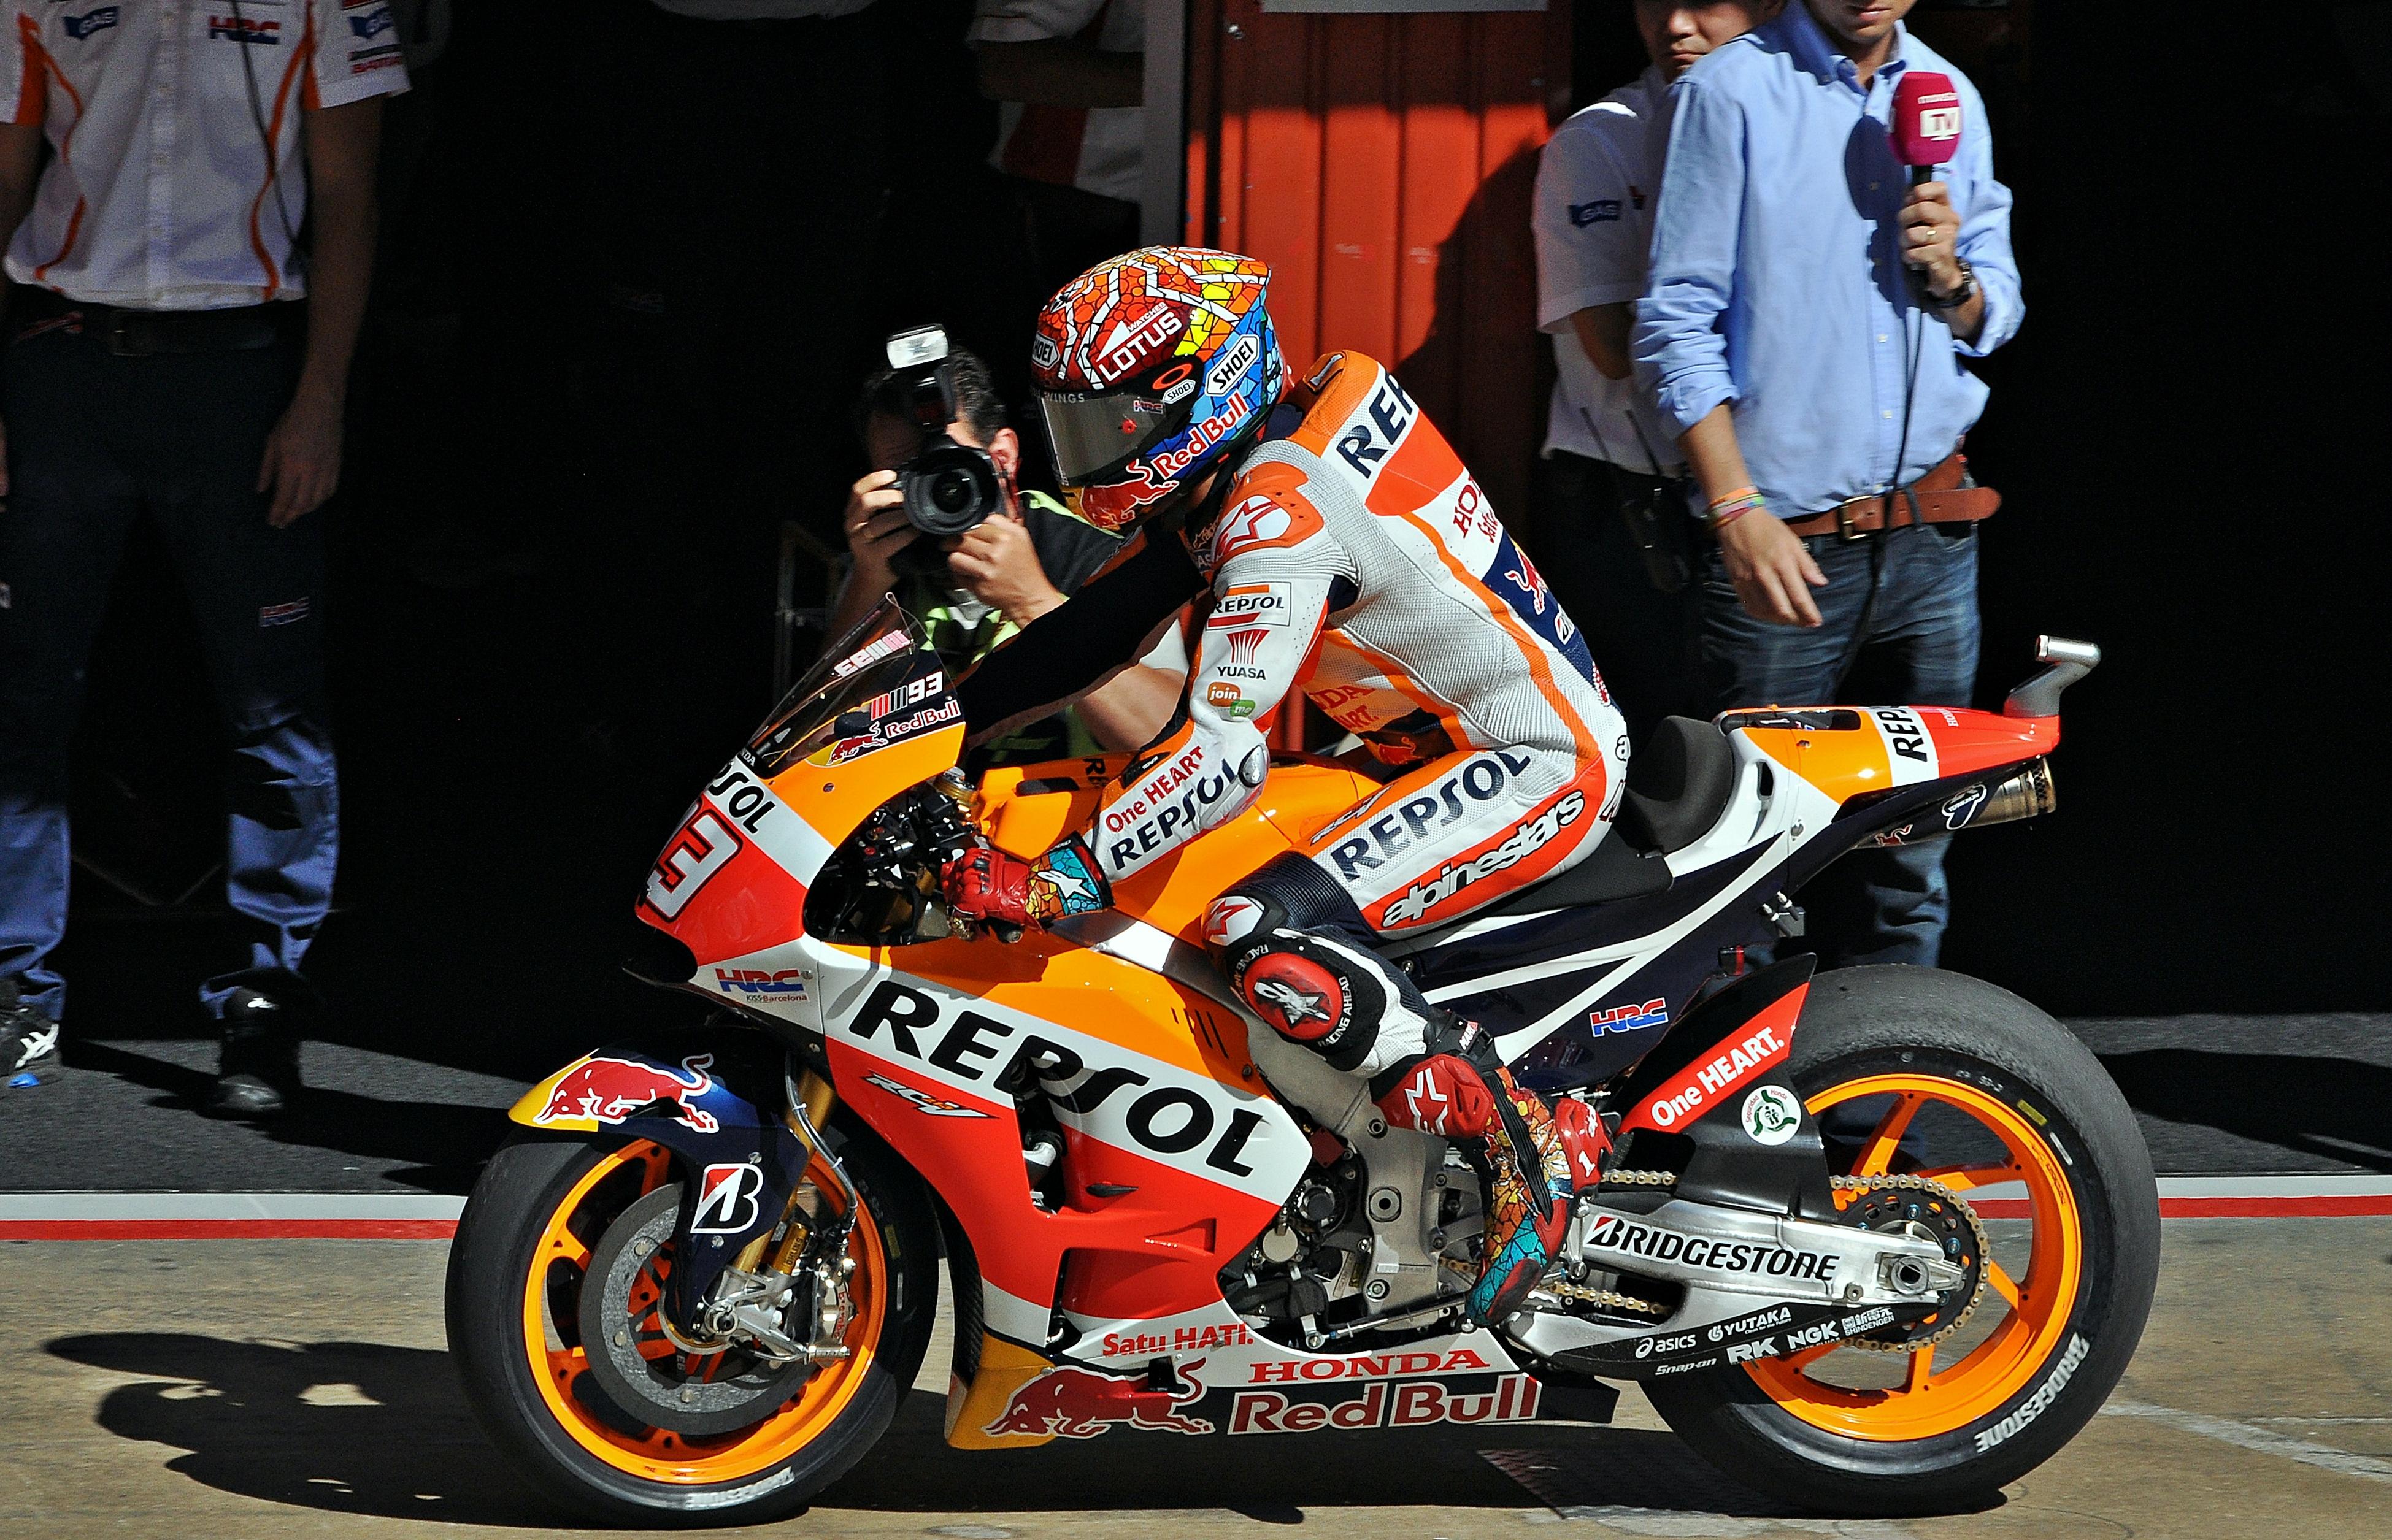 VR46 Racing, Marc Marquez